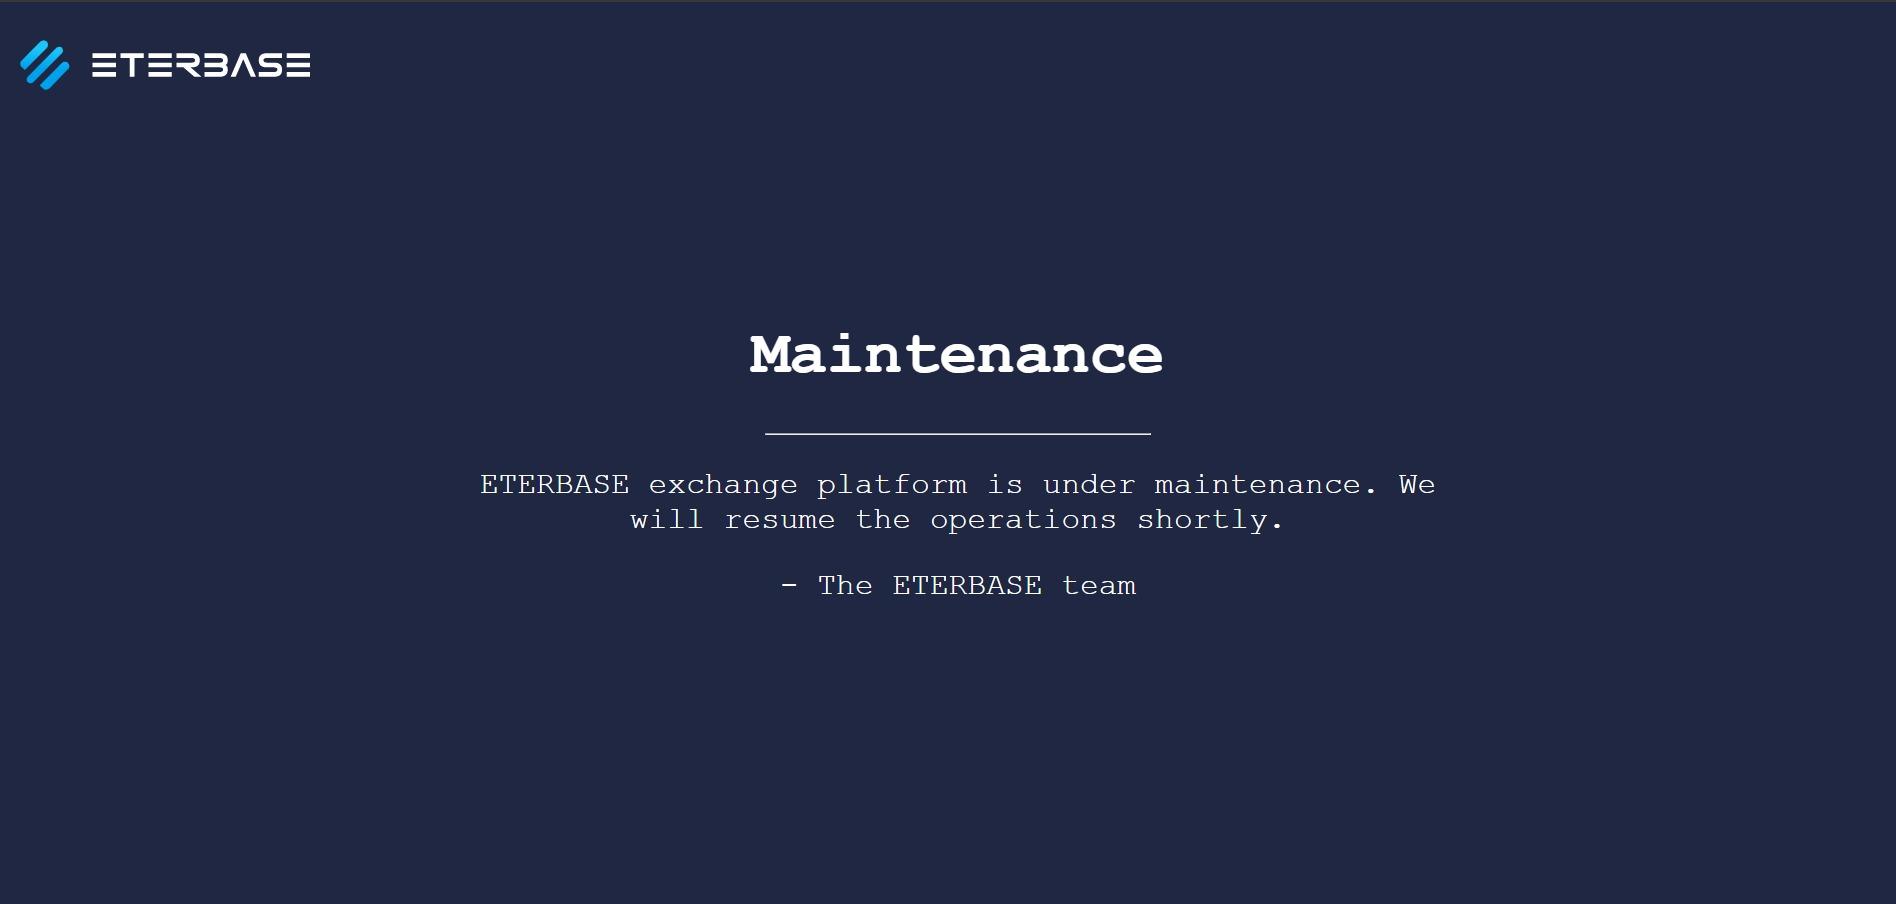 Eterbase hacked